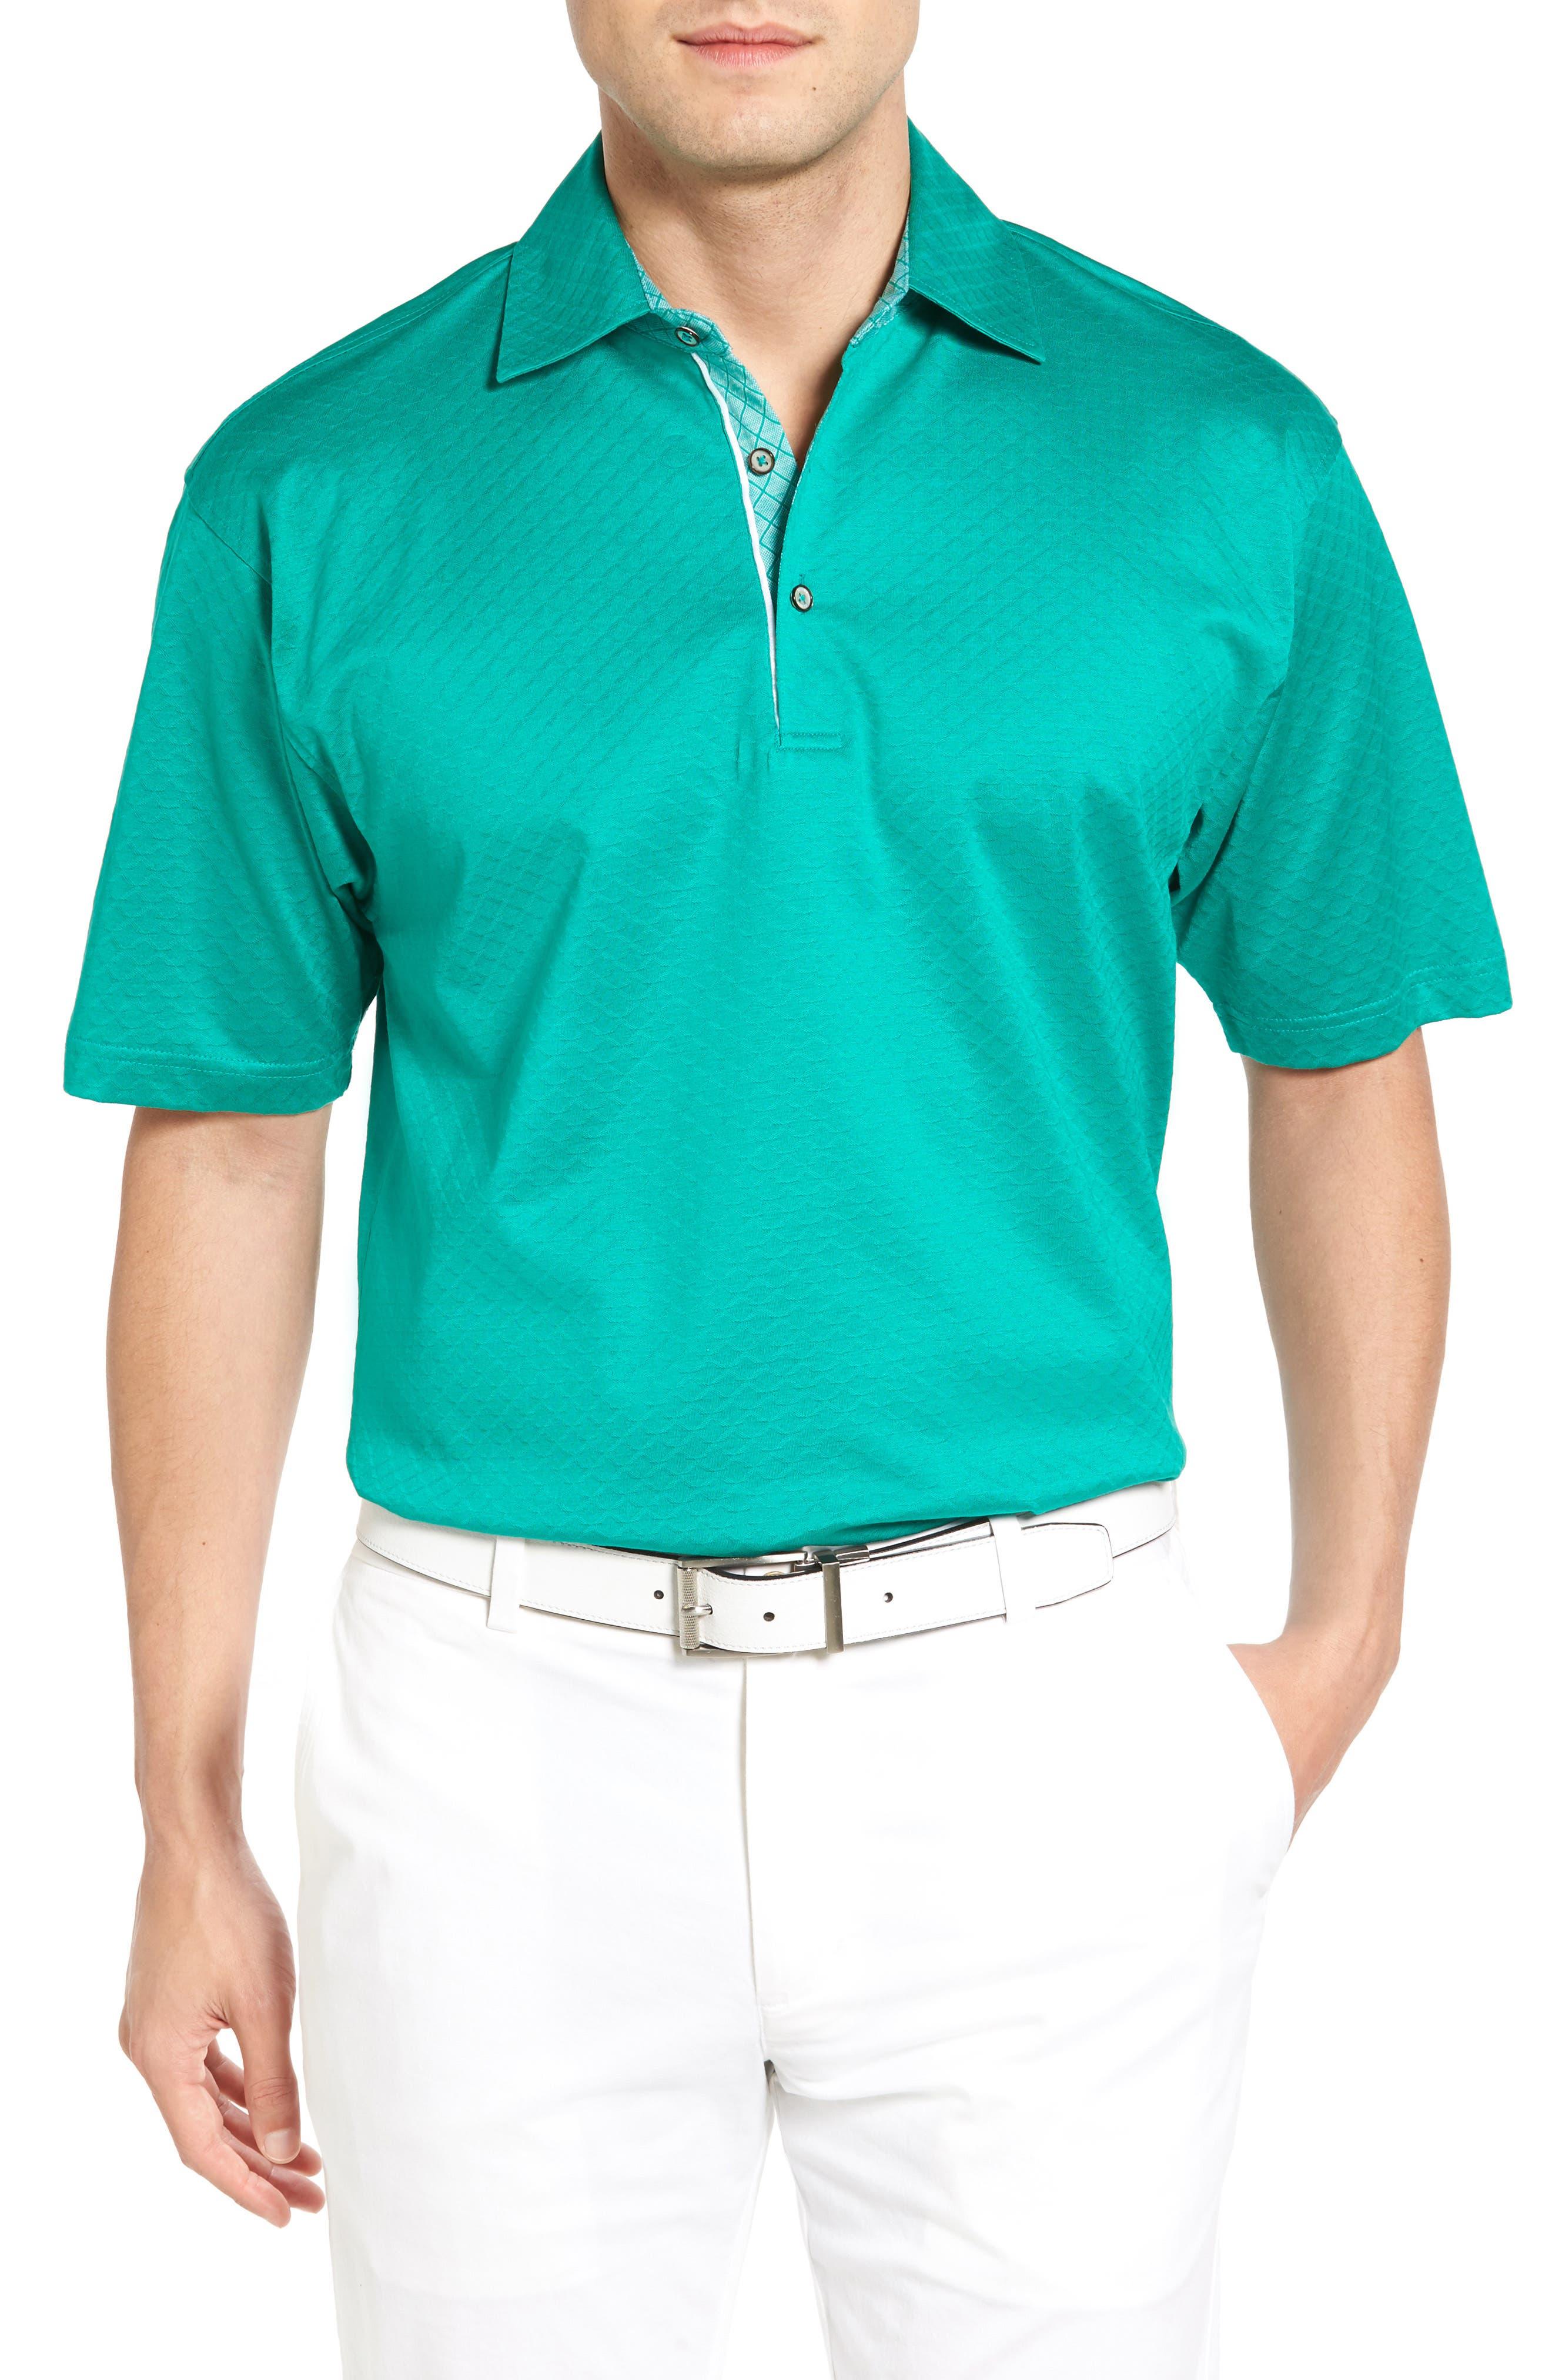 Bobby Jones Diamond Jacquard Golf Polo